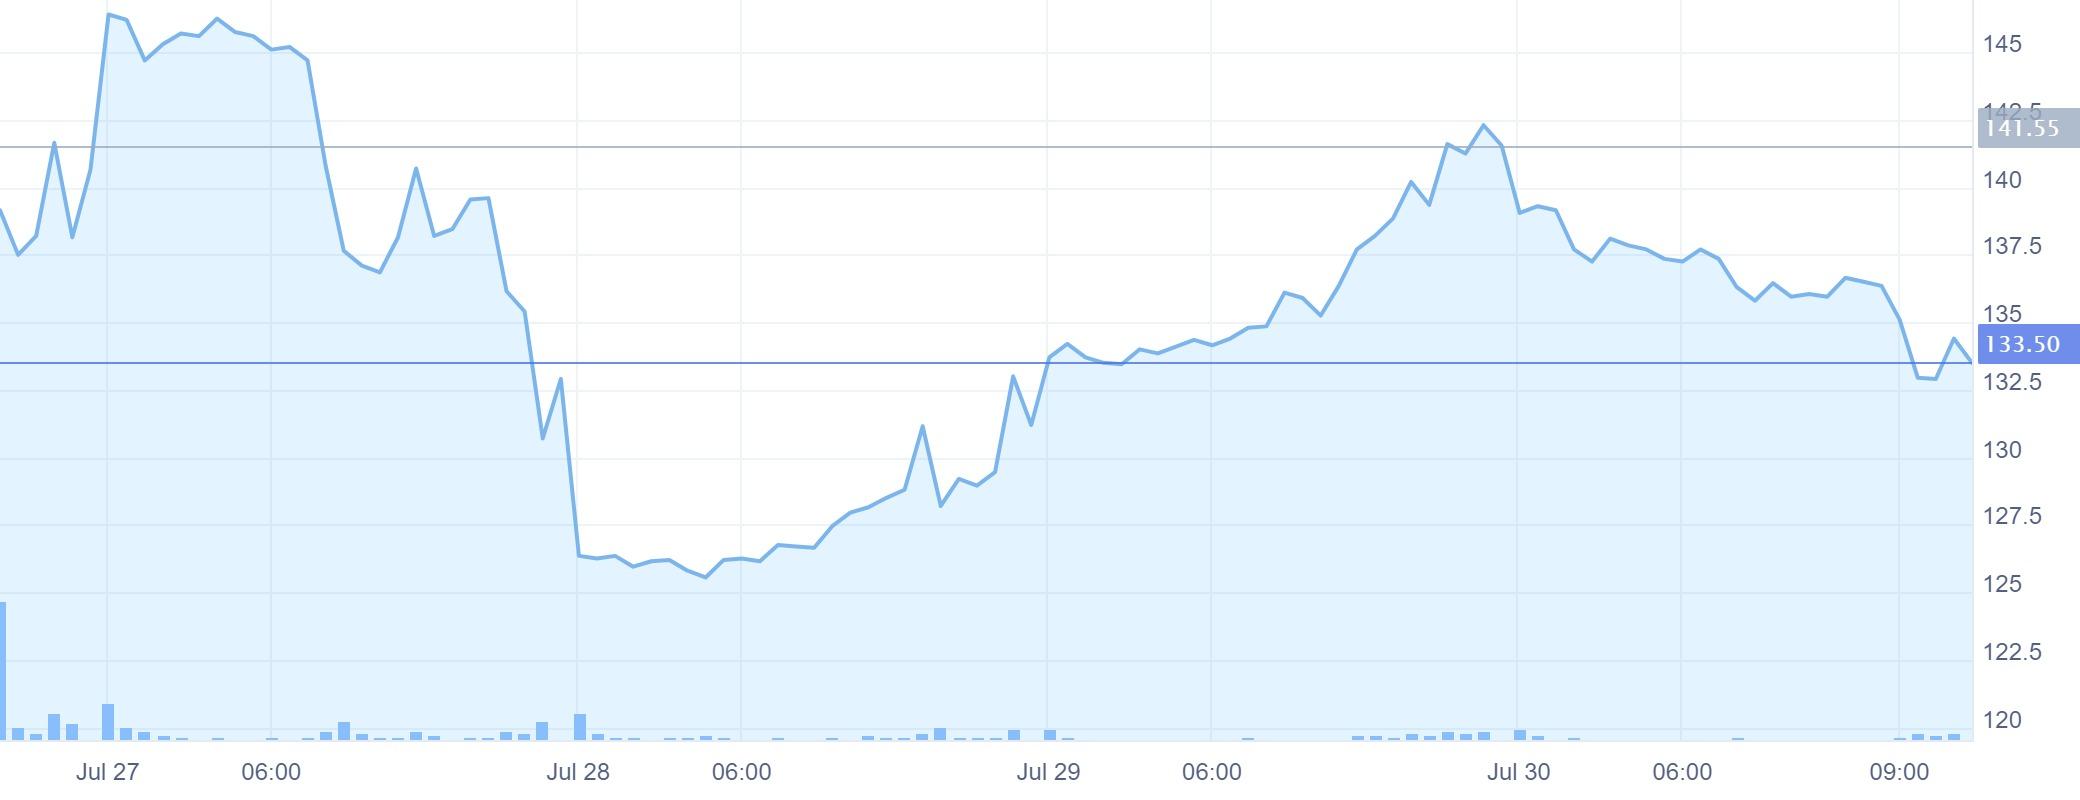 zomato stock performance first week